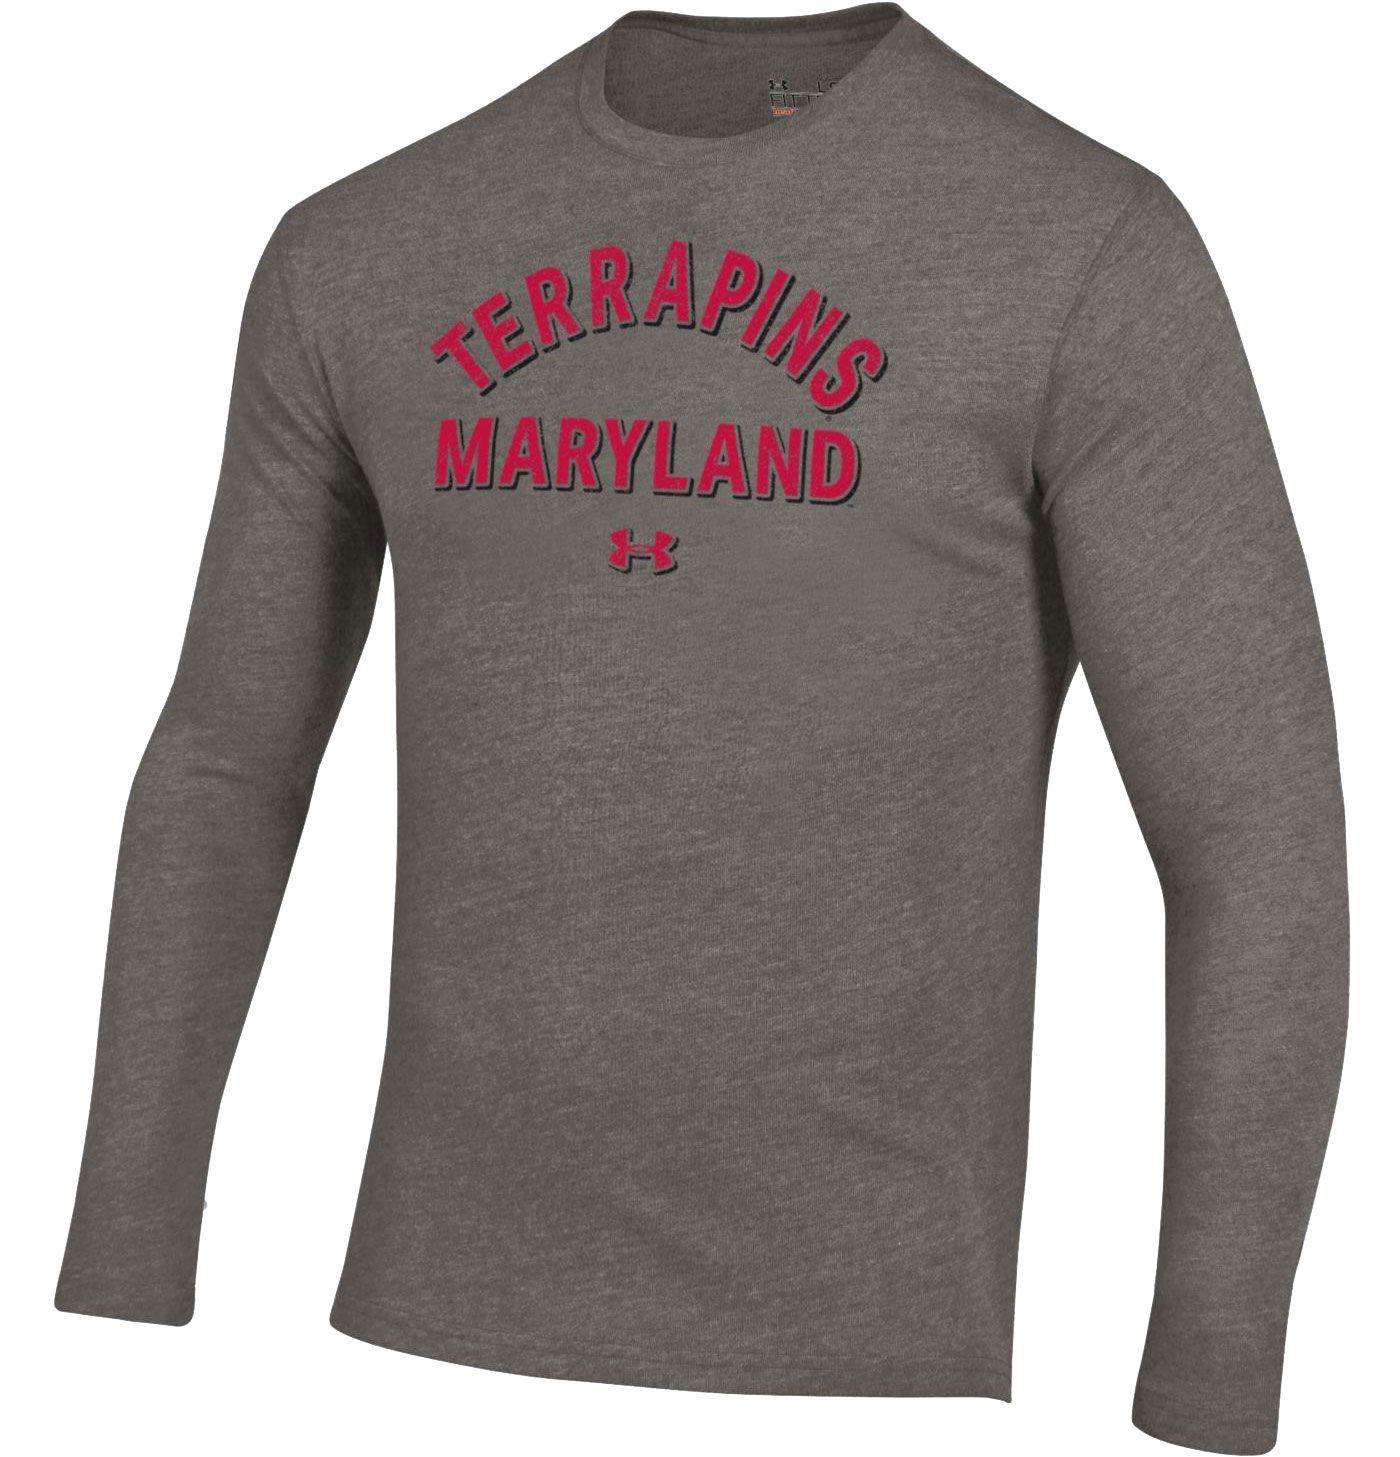 Under Armour Men's Maryland Terrapins Grey Tri-Blend Performance Long Sleeve T-Shirt